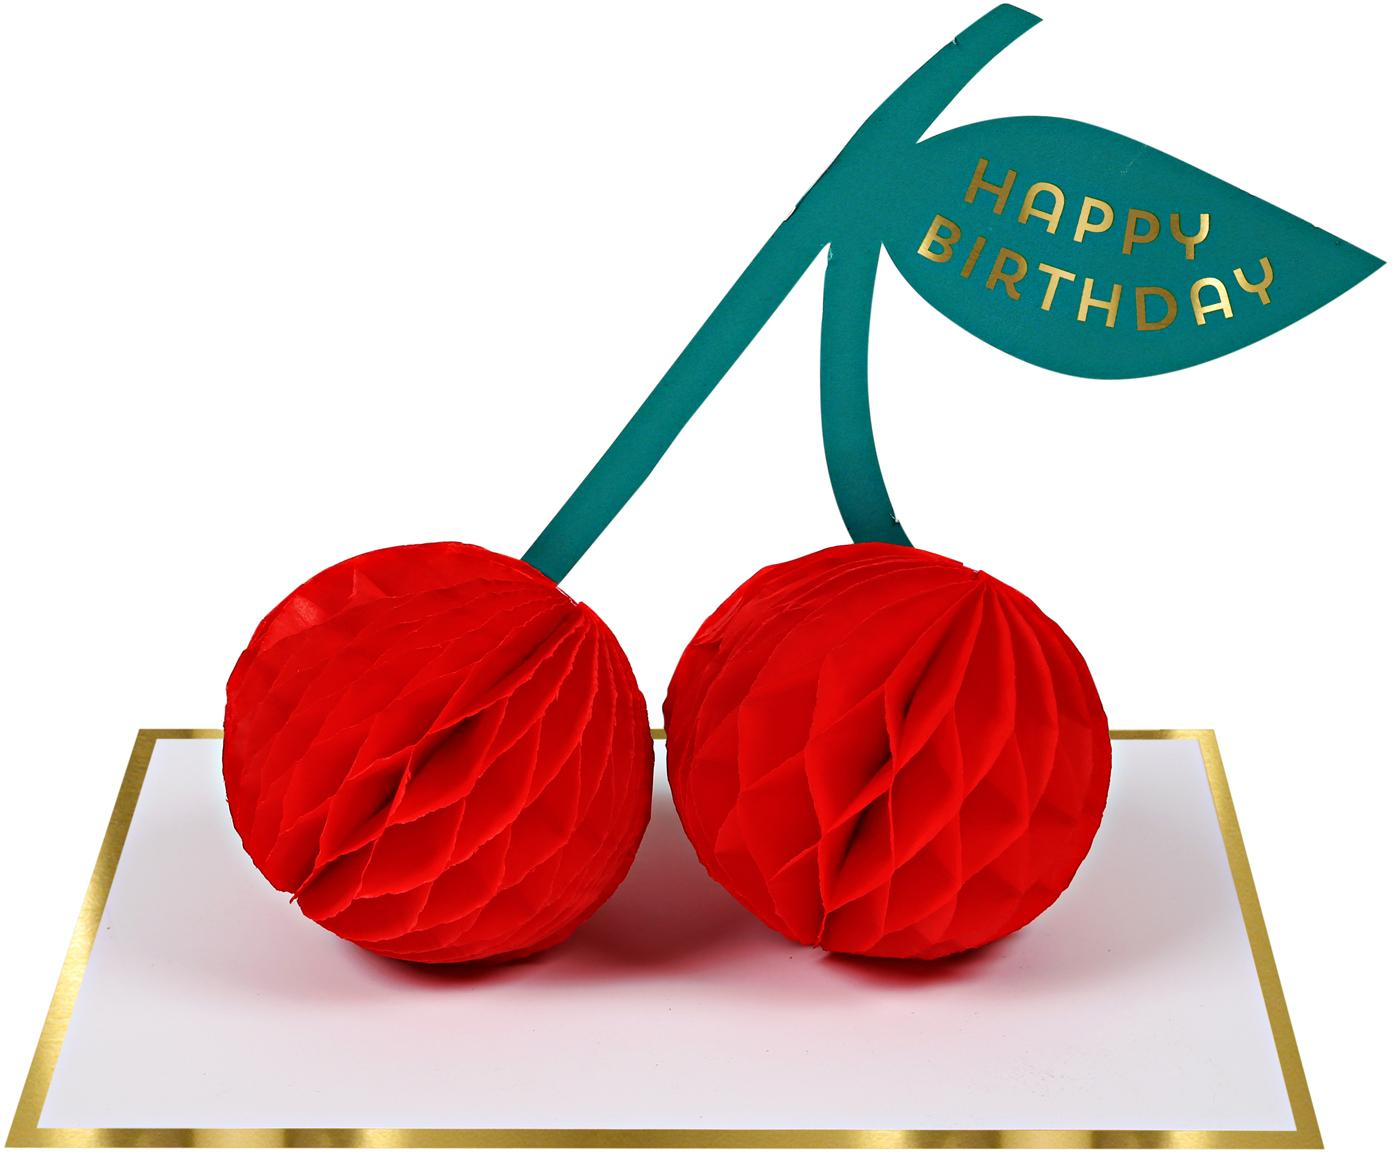 Tarjeta de cumpleaños Cherries, Papel, Blanco, dorado, rojo, verde, L 13 x An 19 cm